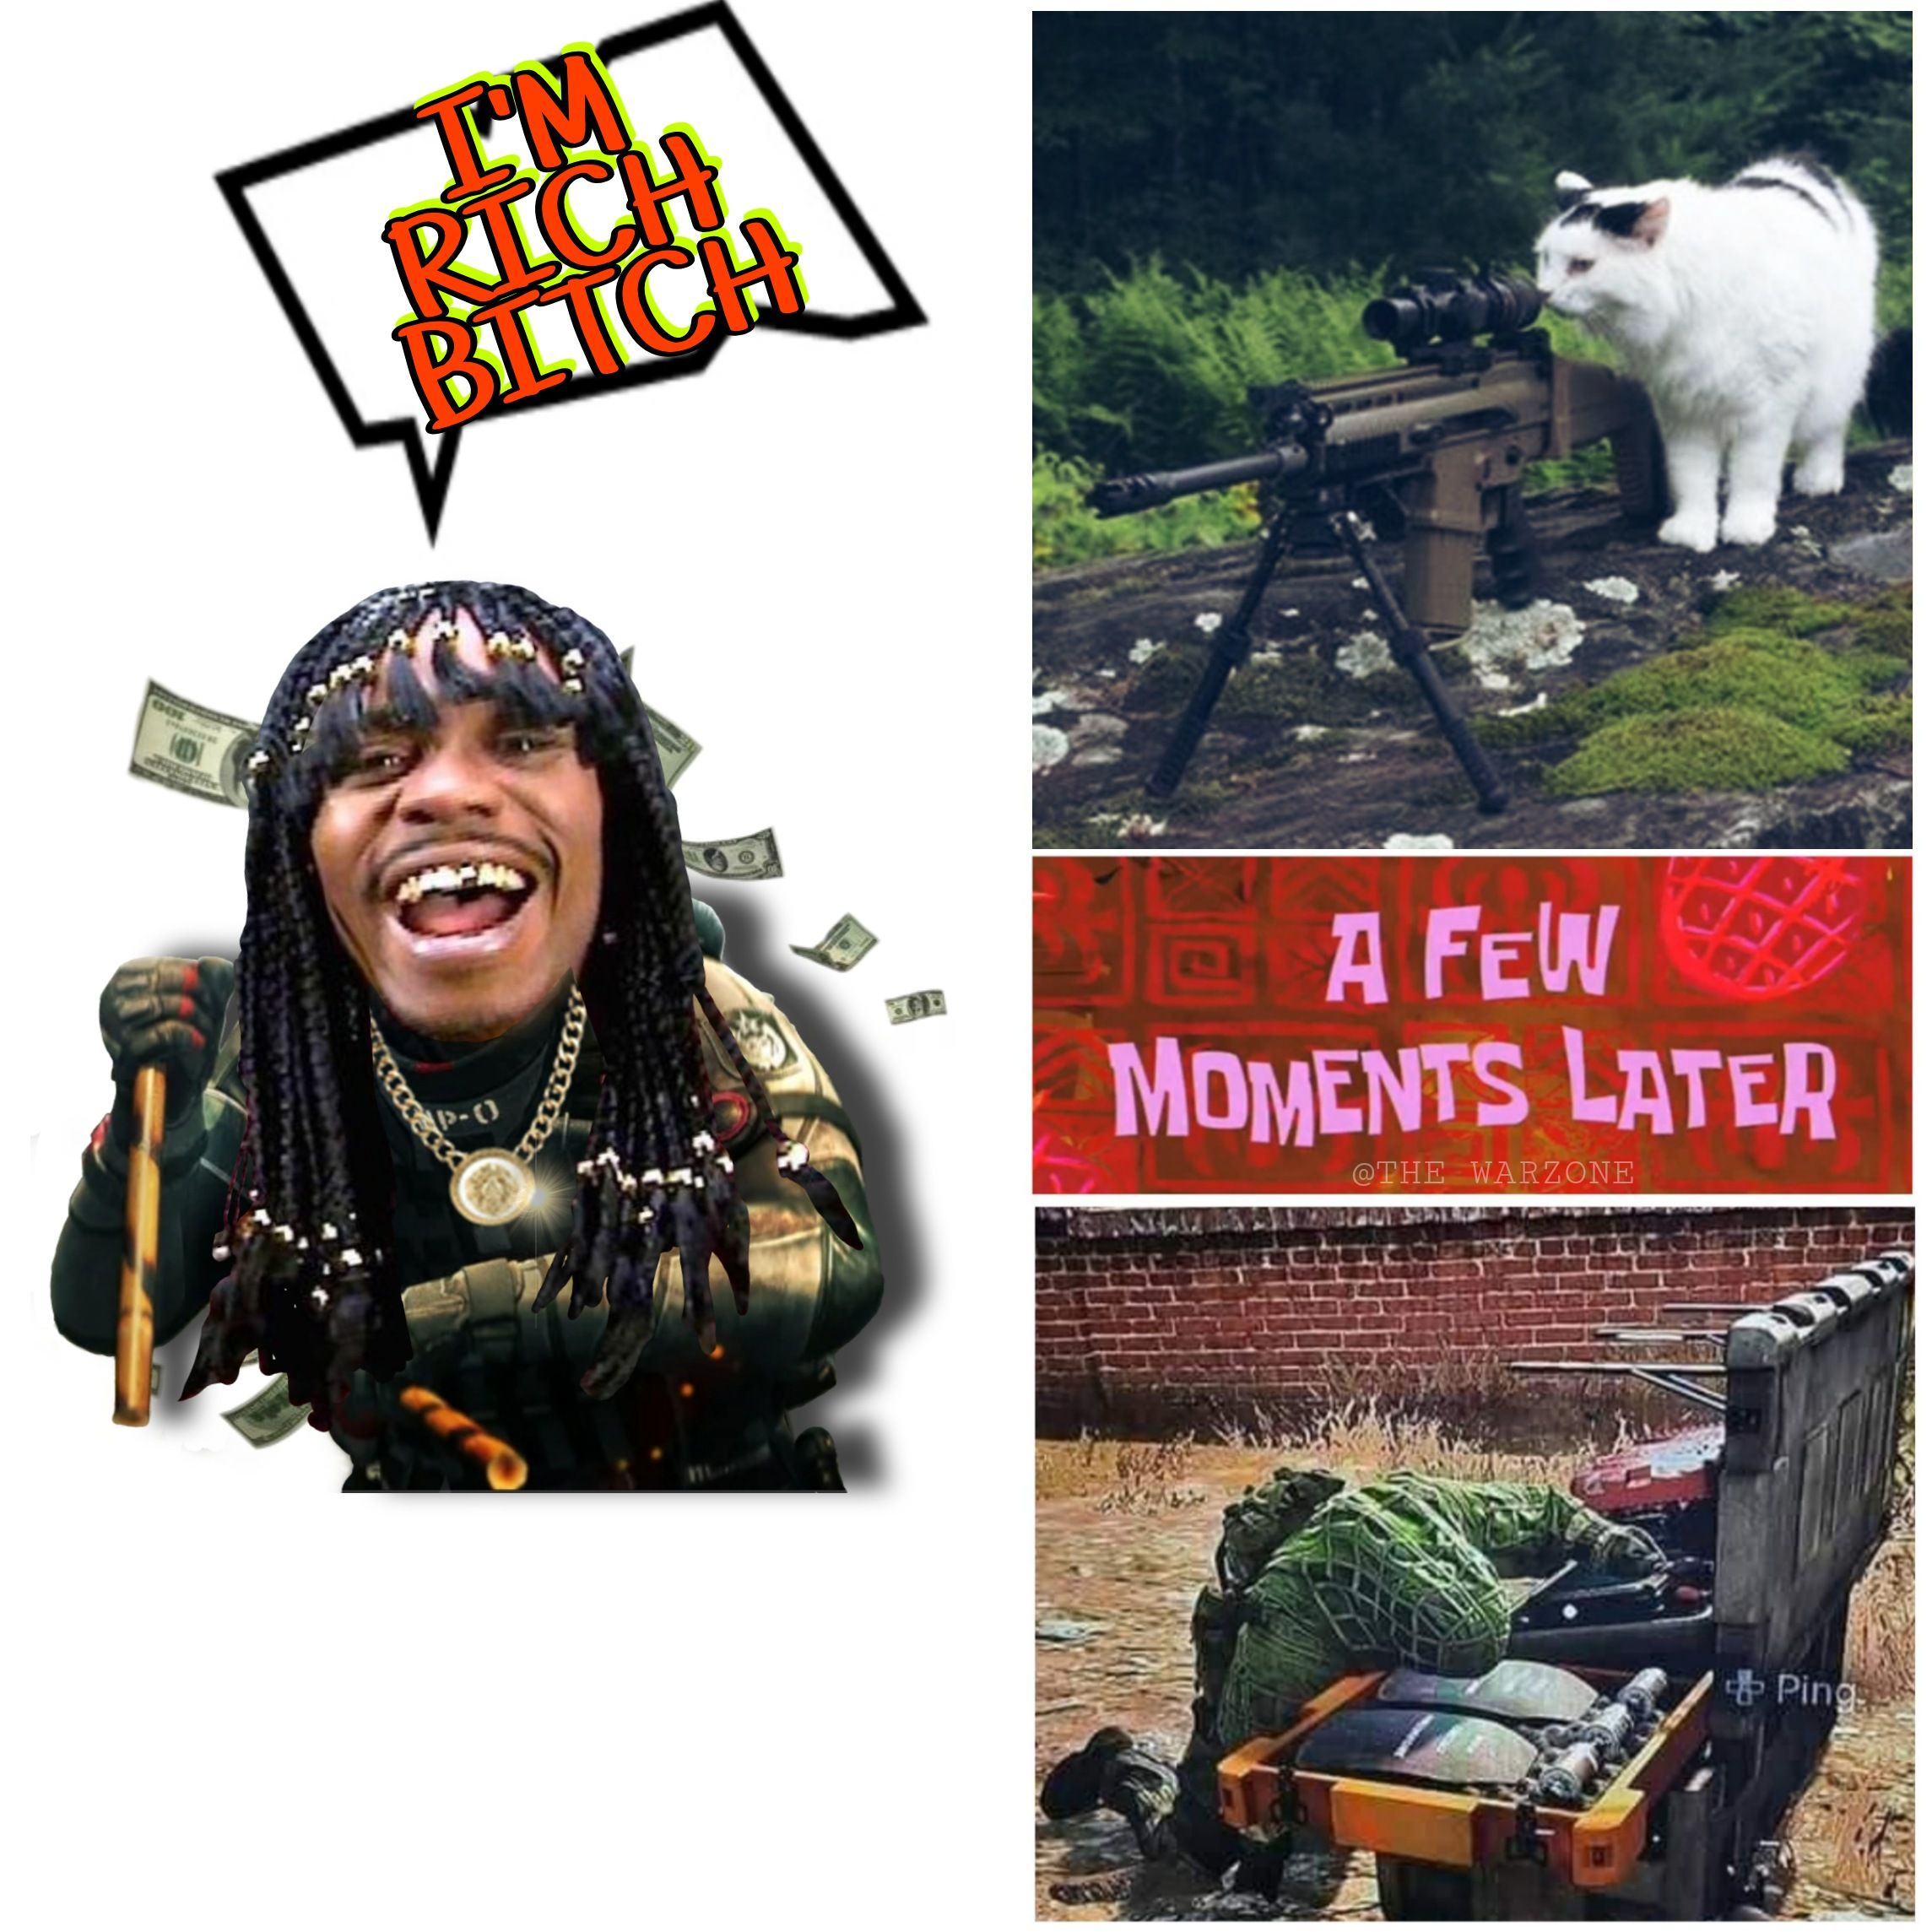 Warzone Memes Warzoned Call Of Duty Memes Gaming Memes In 2021 Gaming Memes New Memes Memes